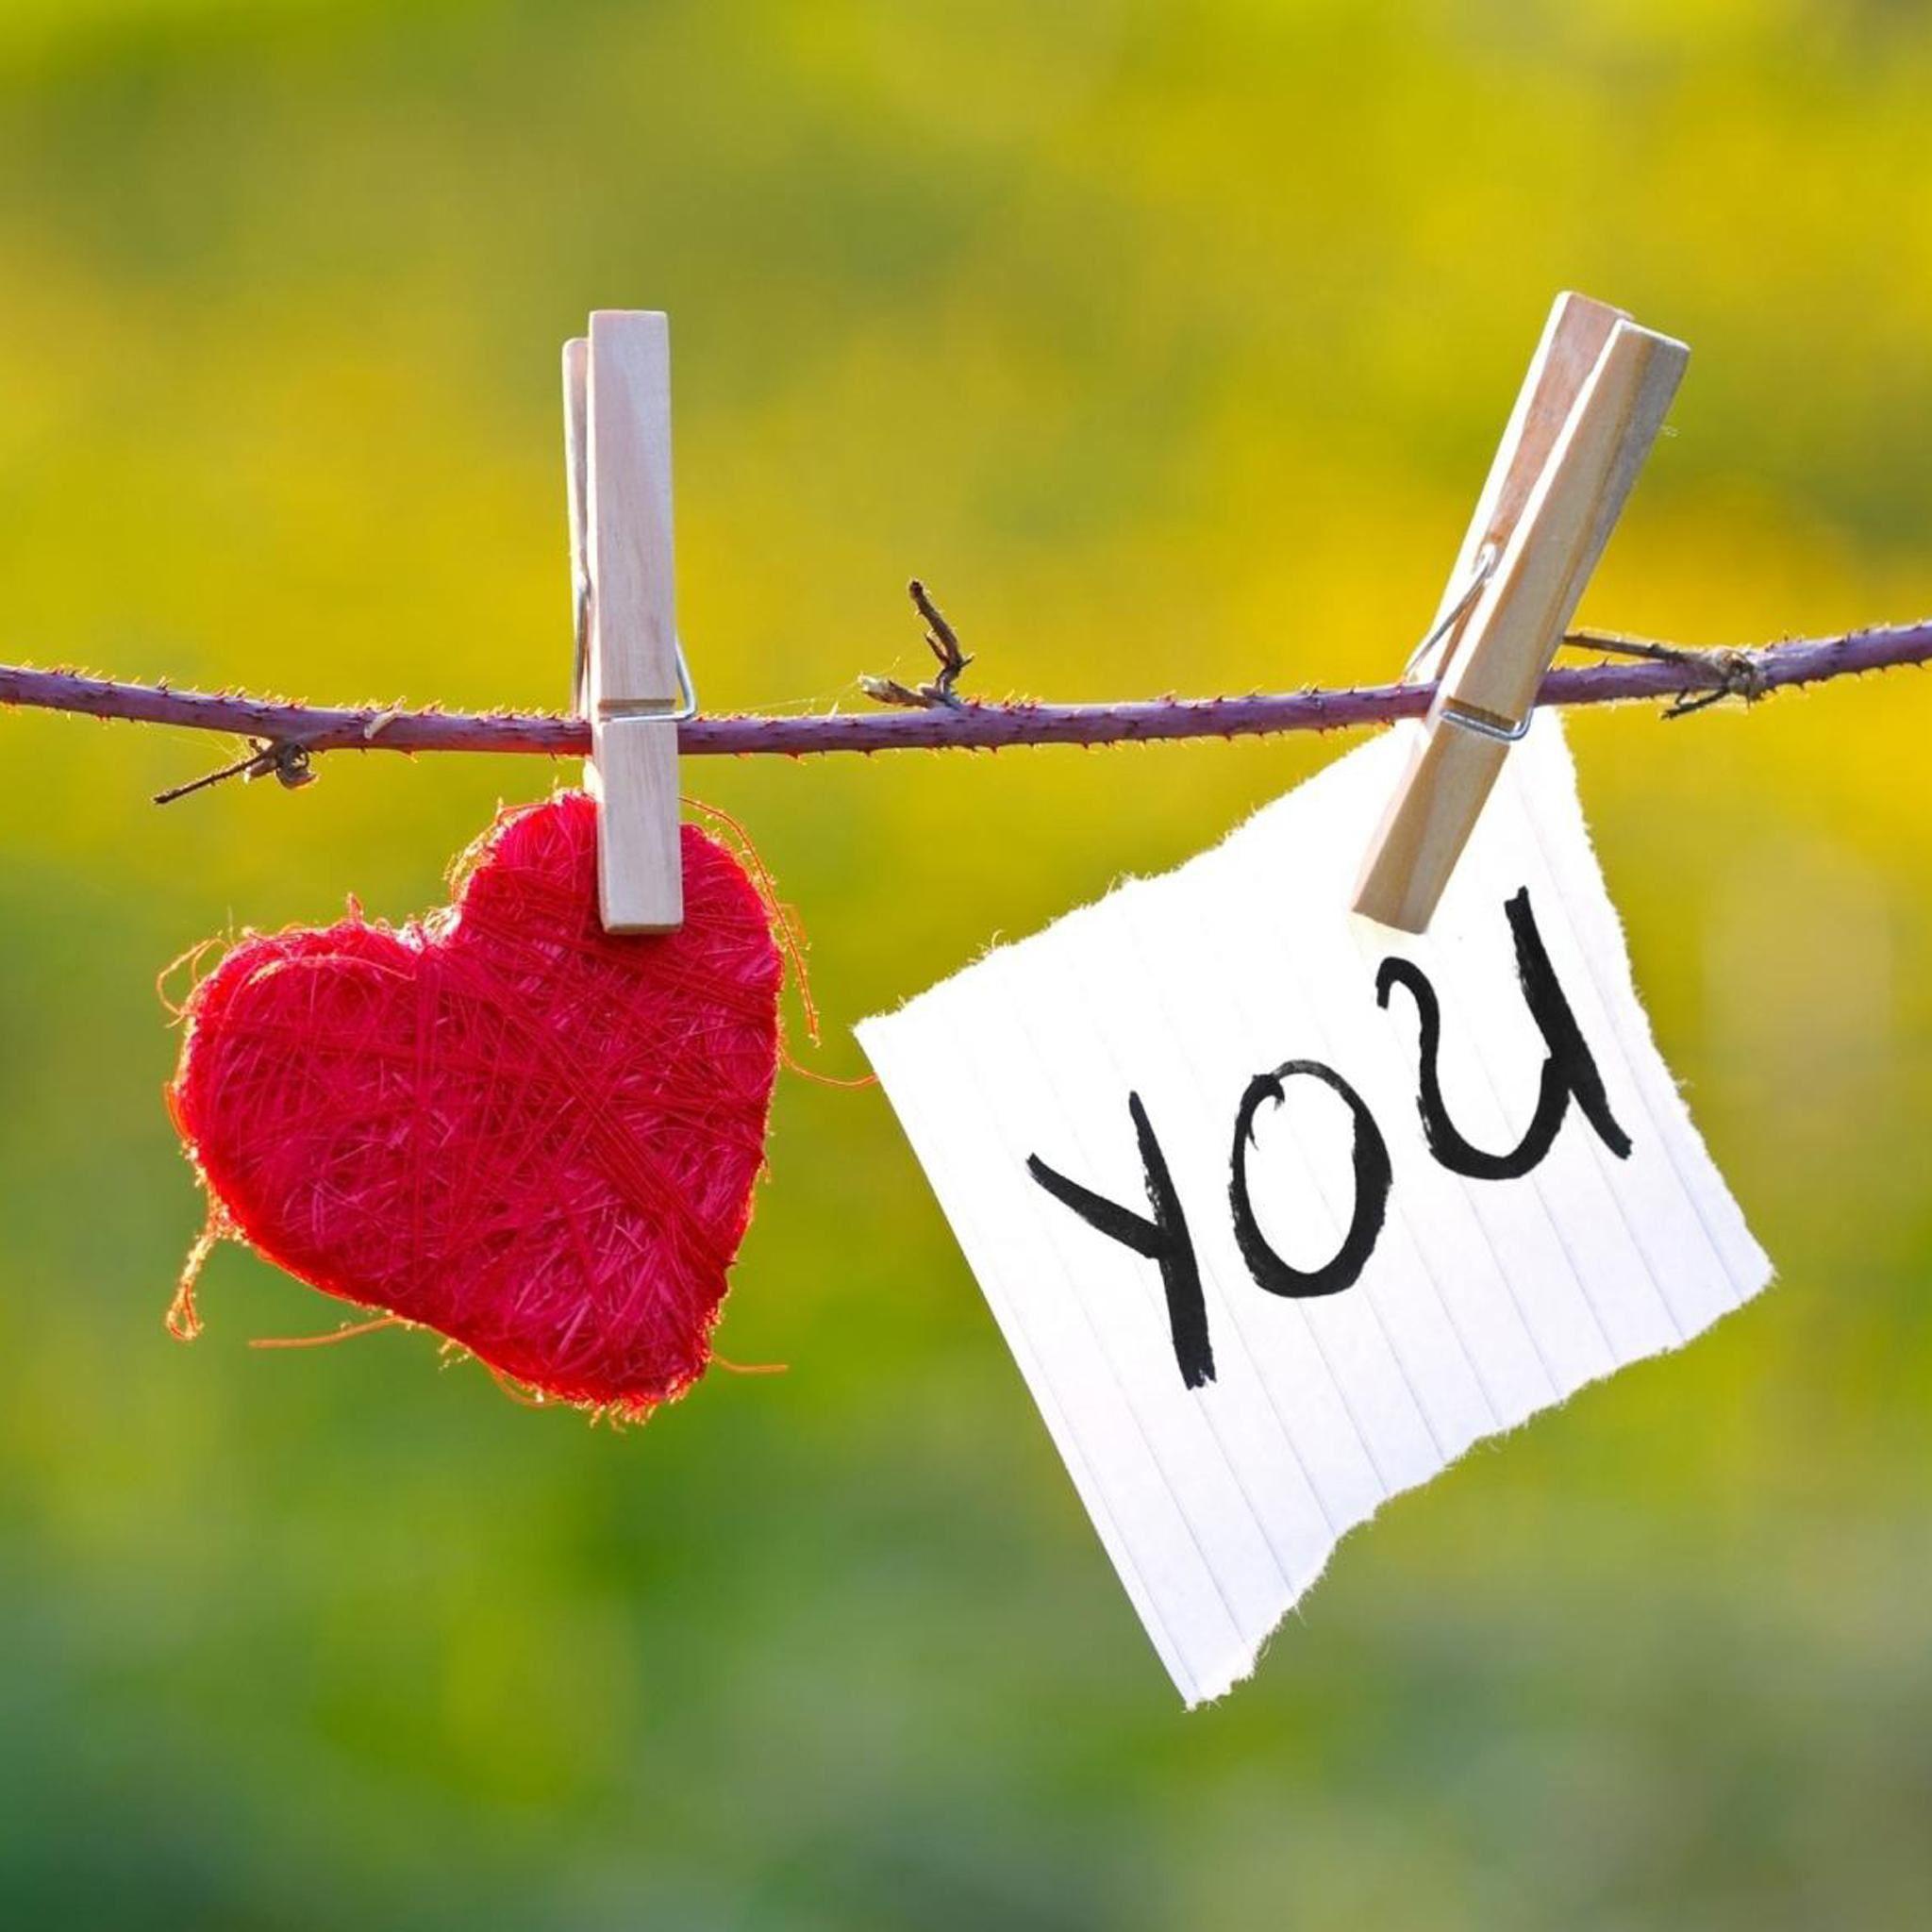 Love You Clothes Clip Ipad Air Wallpaper Download Iphone